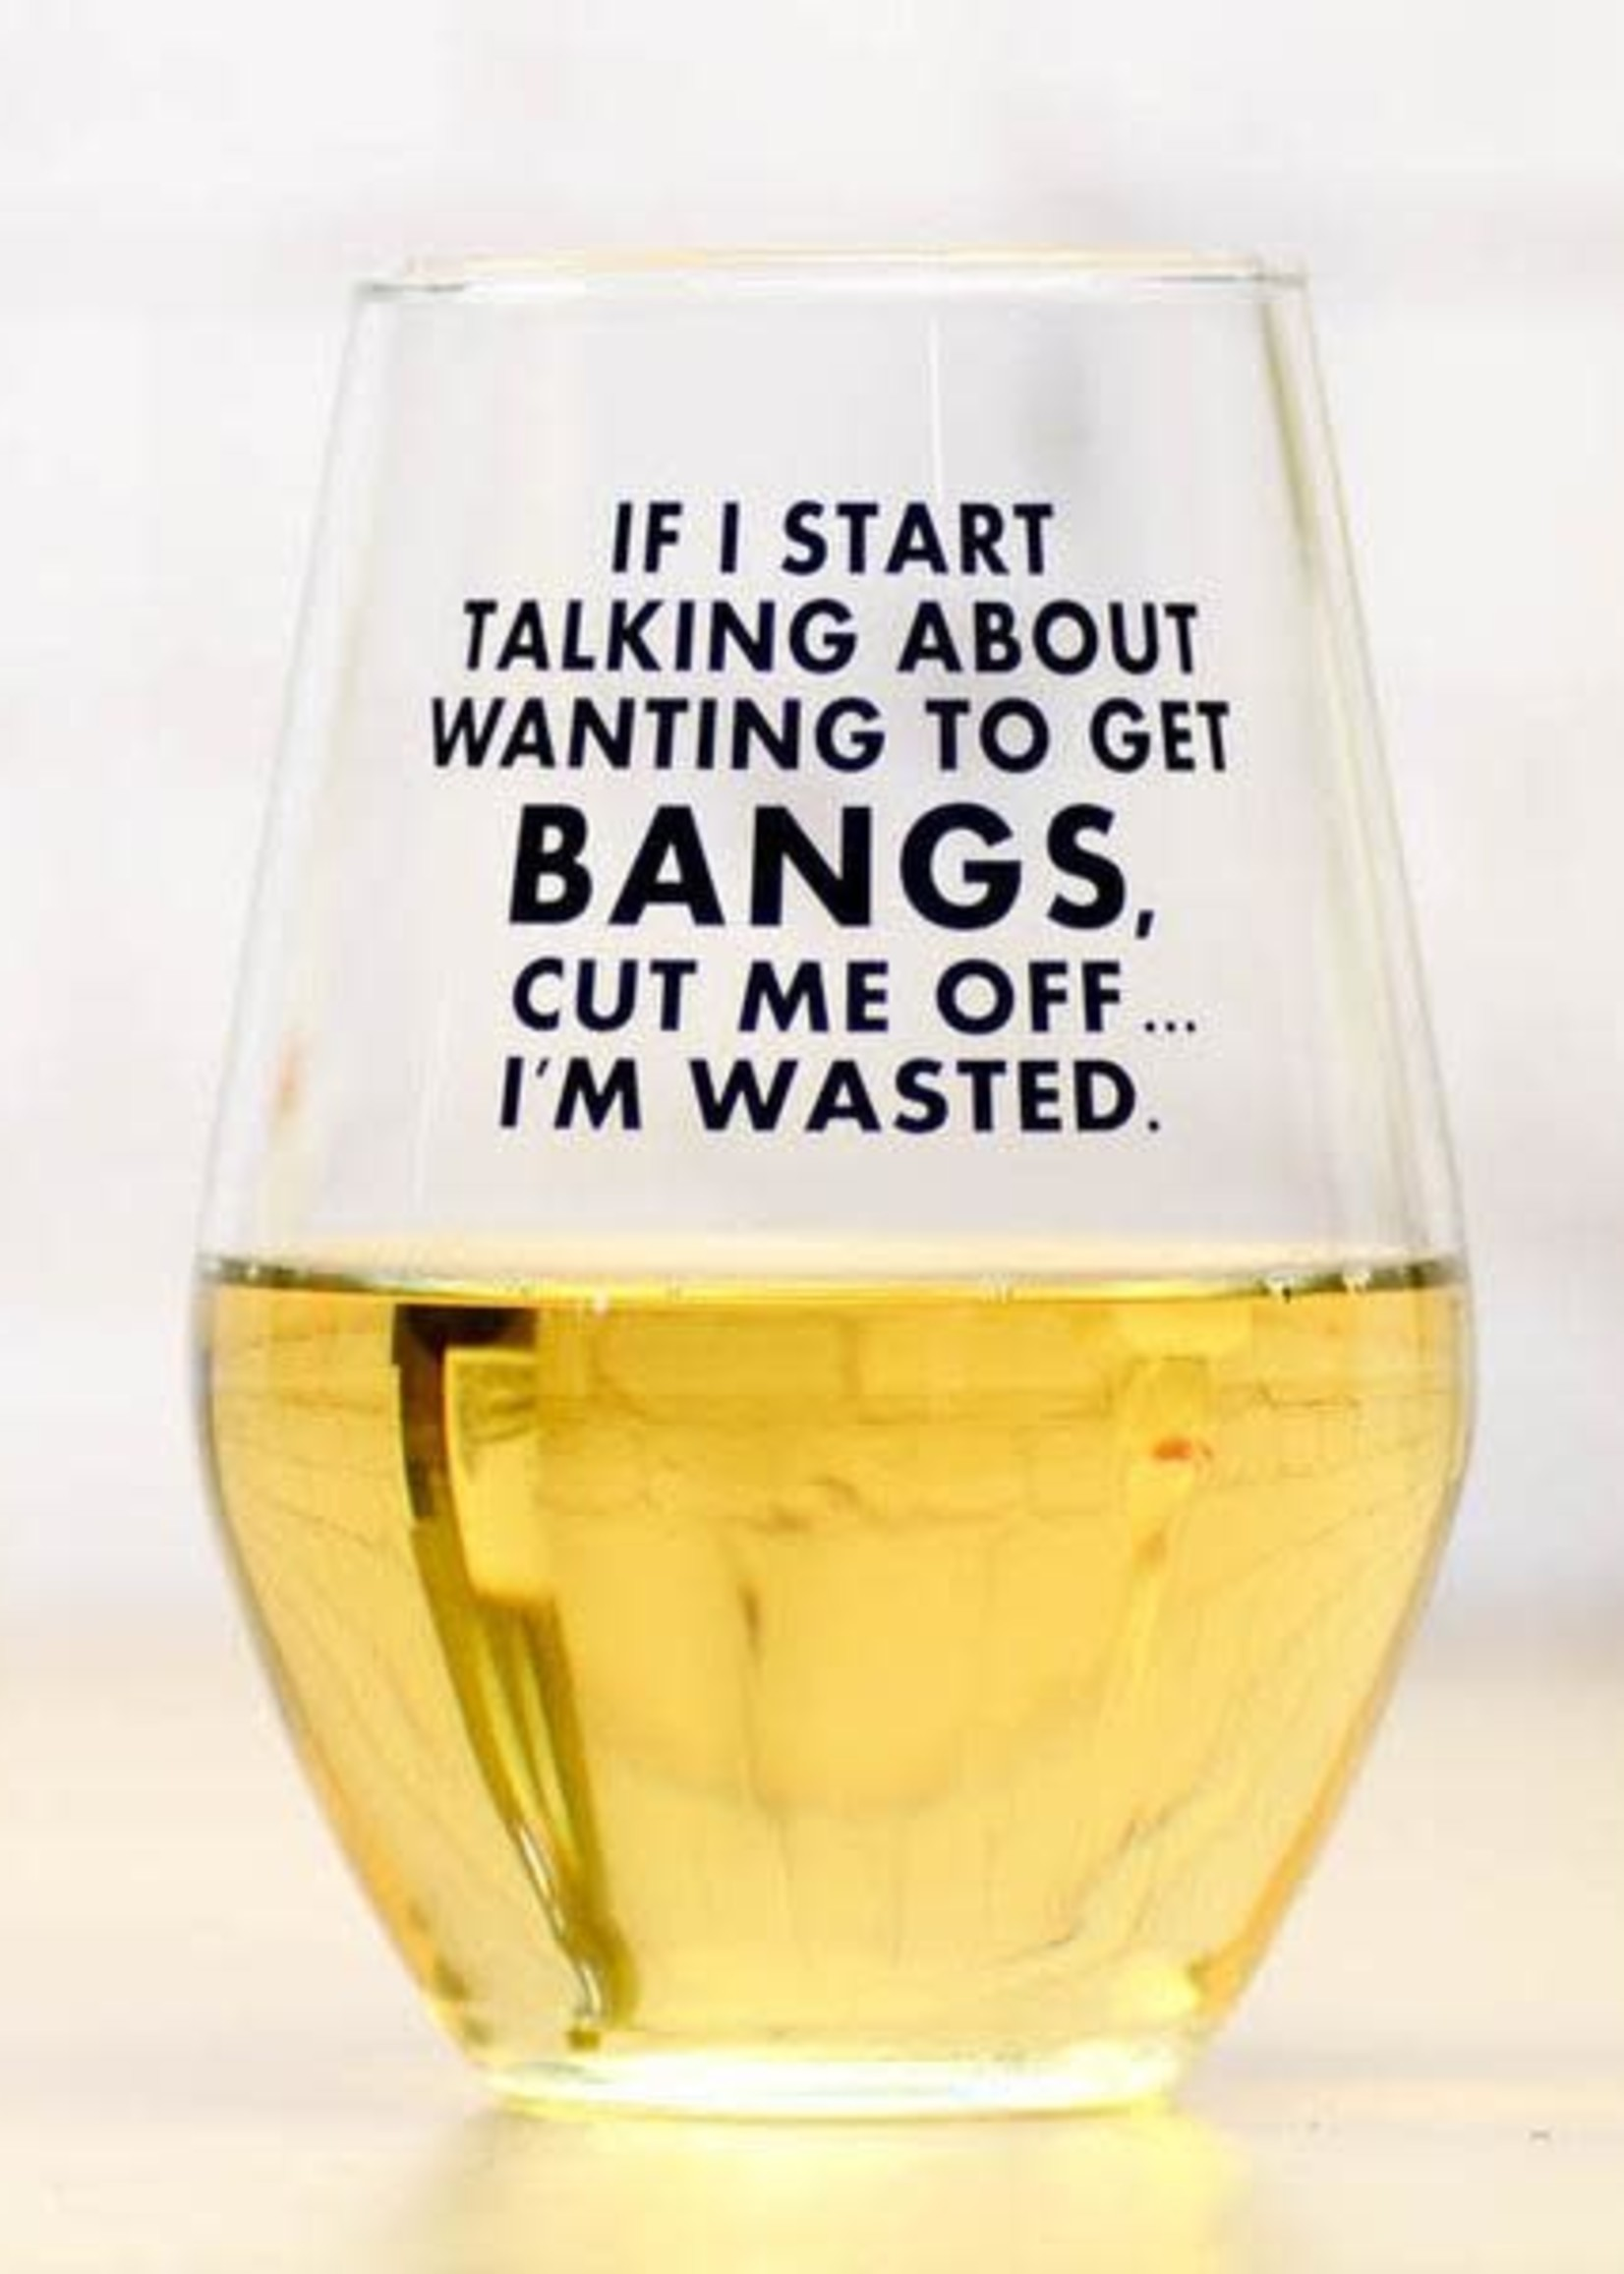 MERIWETHER MERIWETHER CUTTING BANGS - WINE GLASS